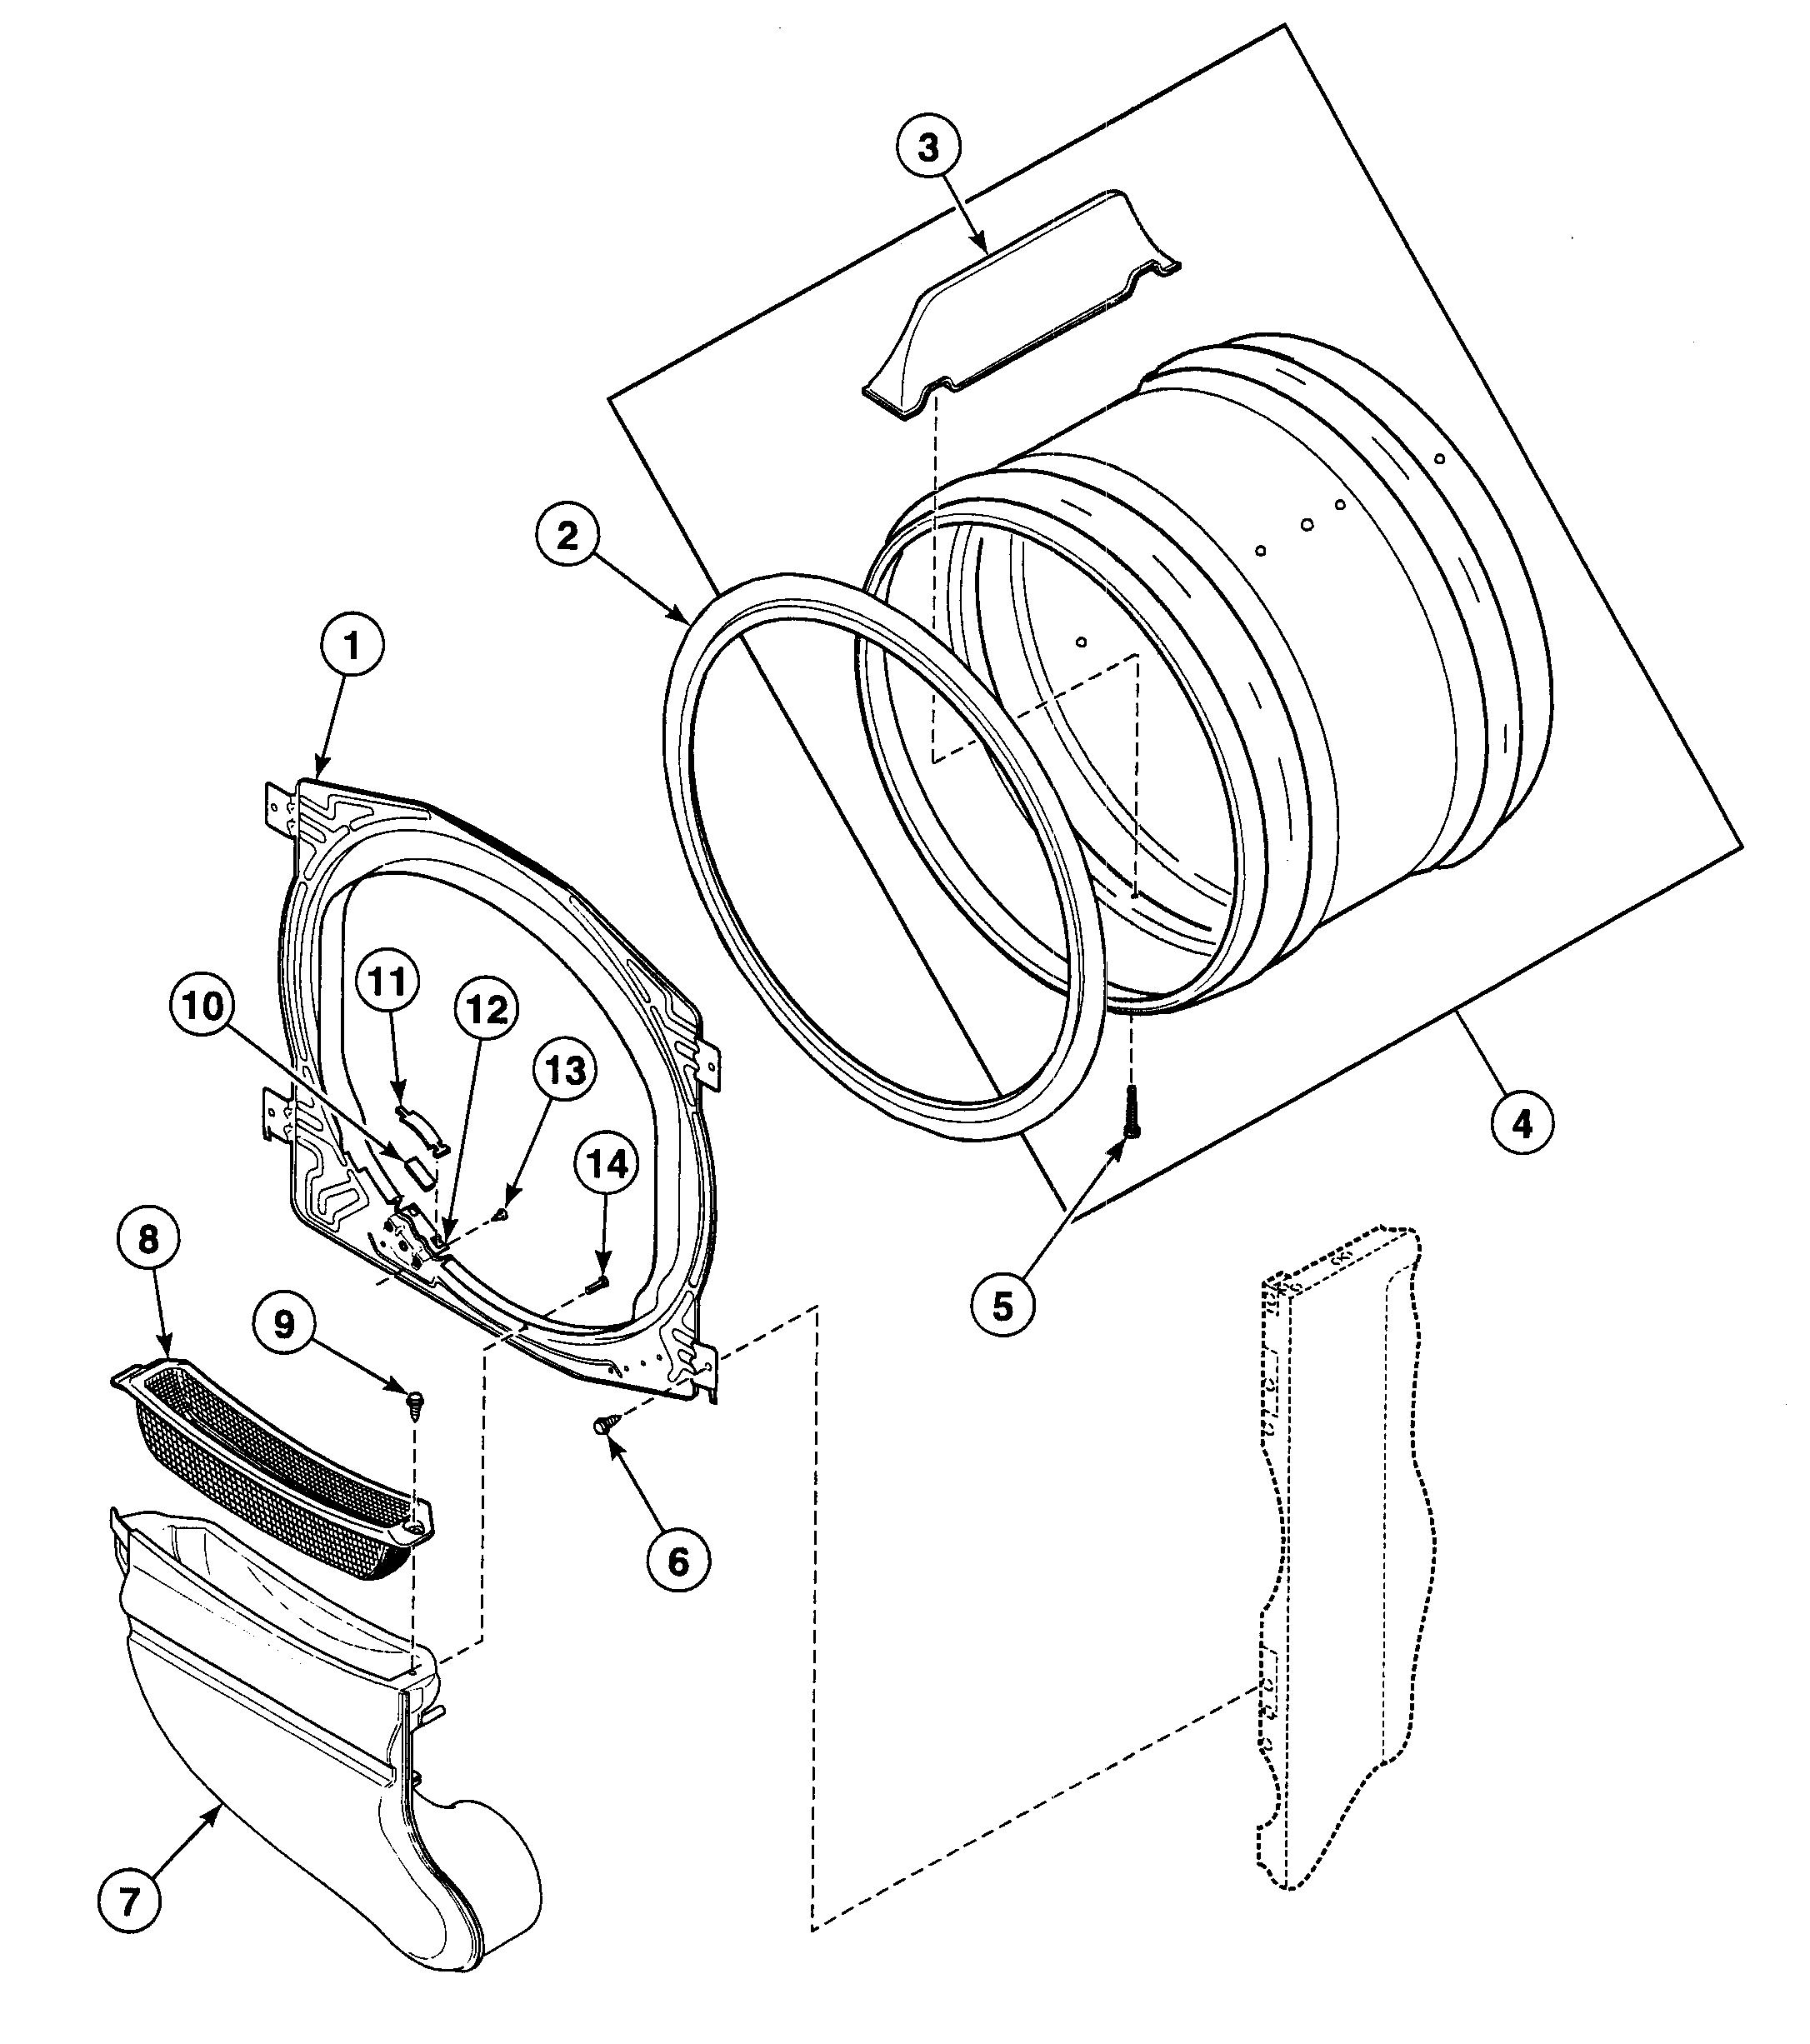 wiring diagram for speed queen dryer model ade3srgs173tw01